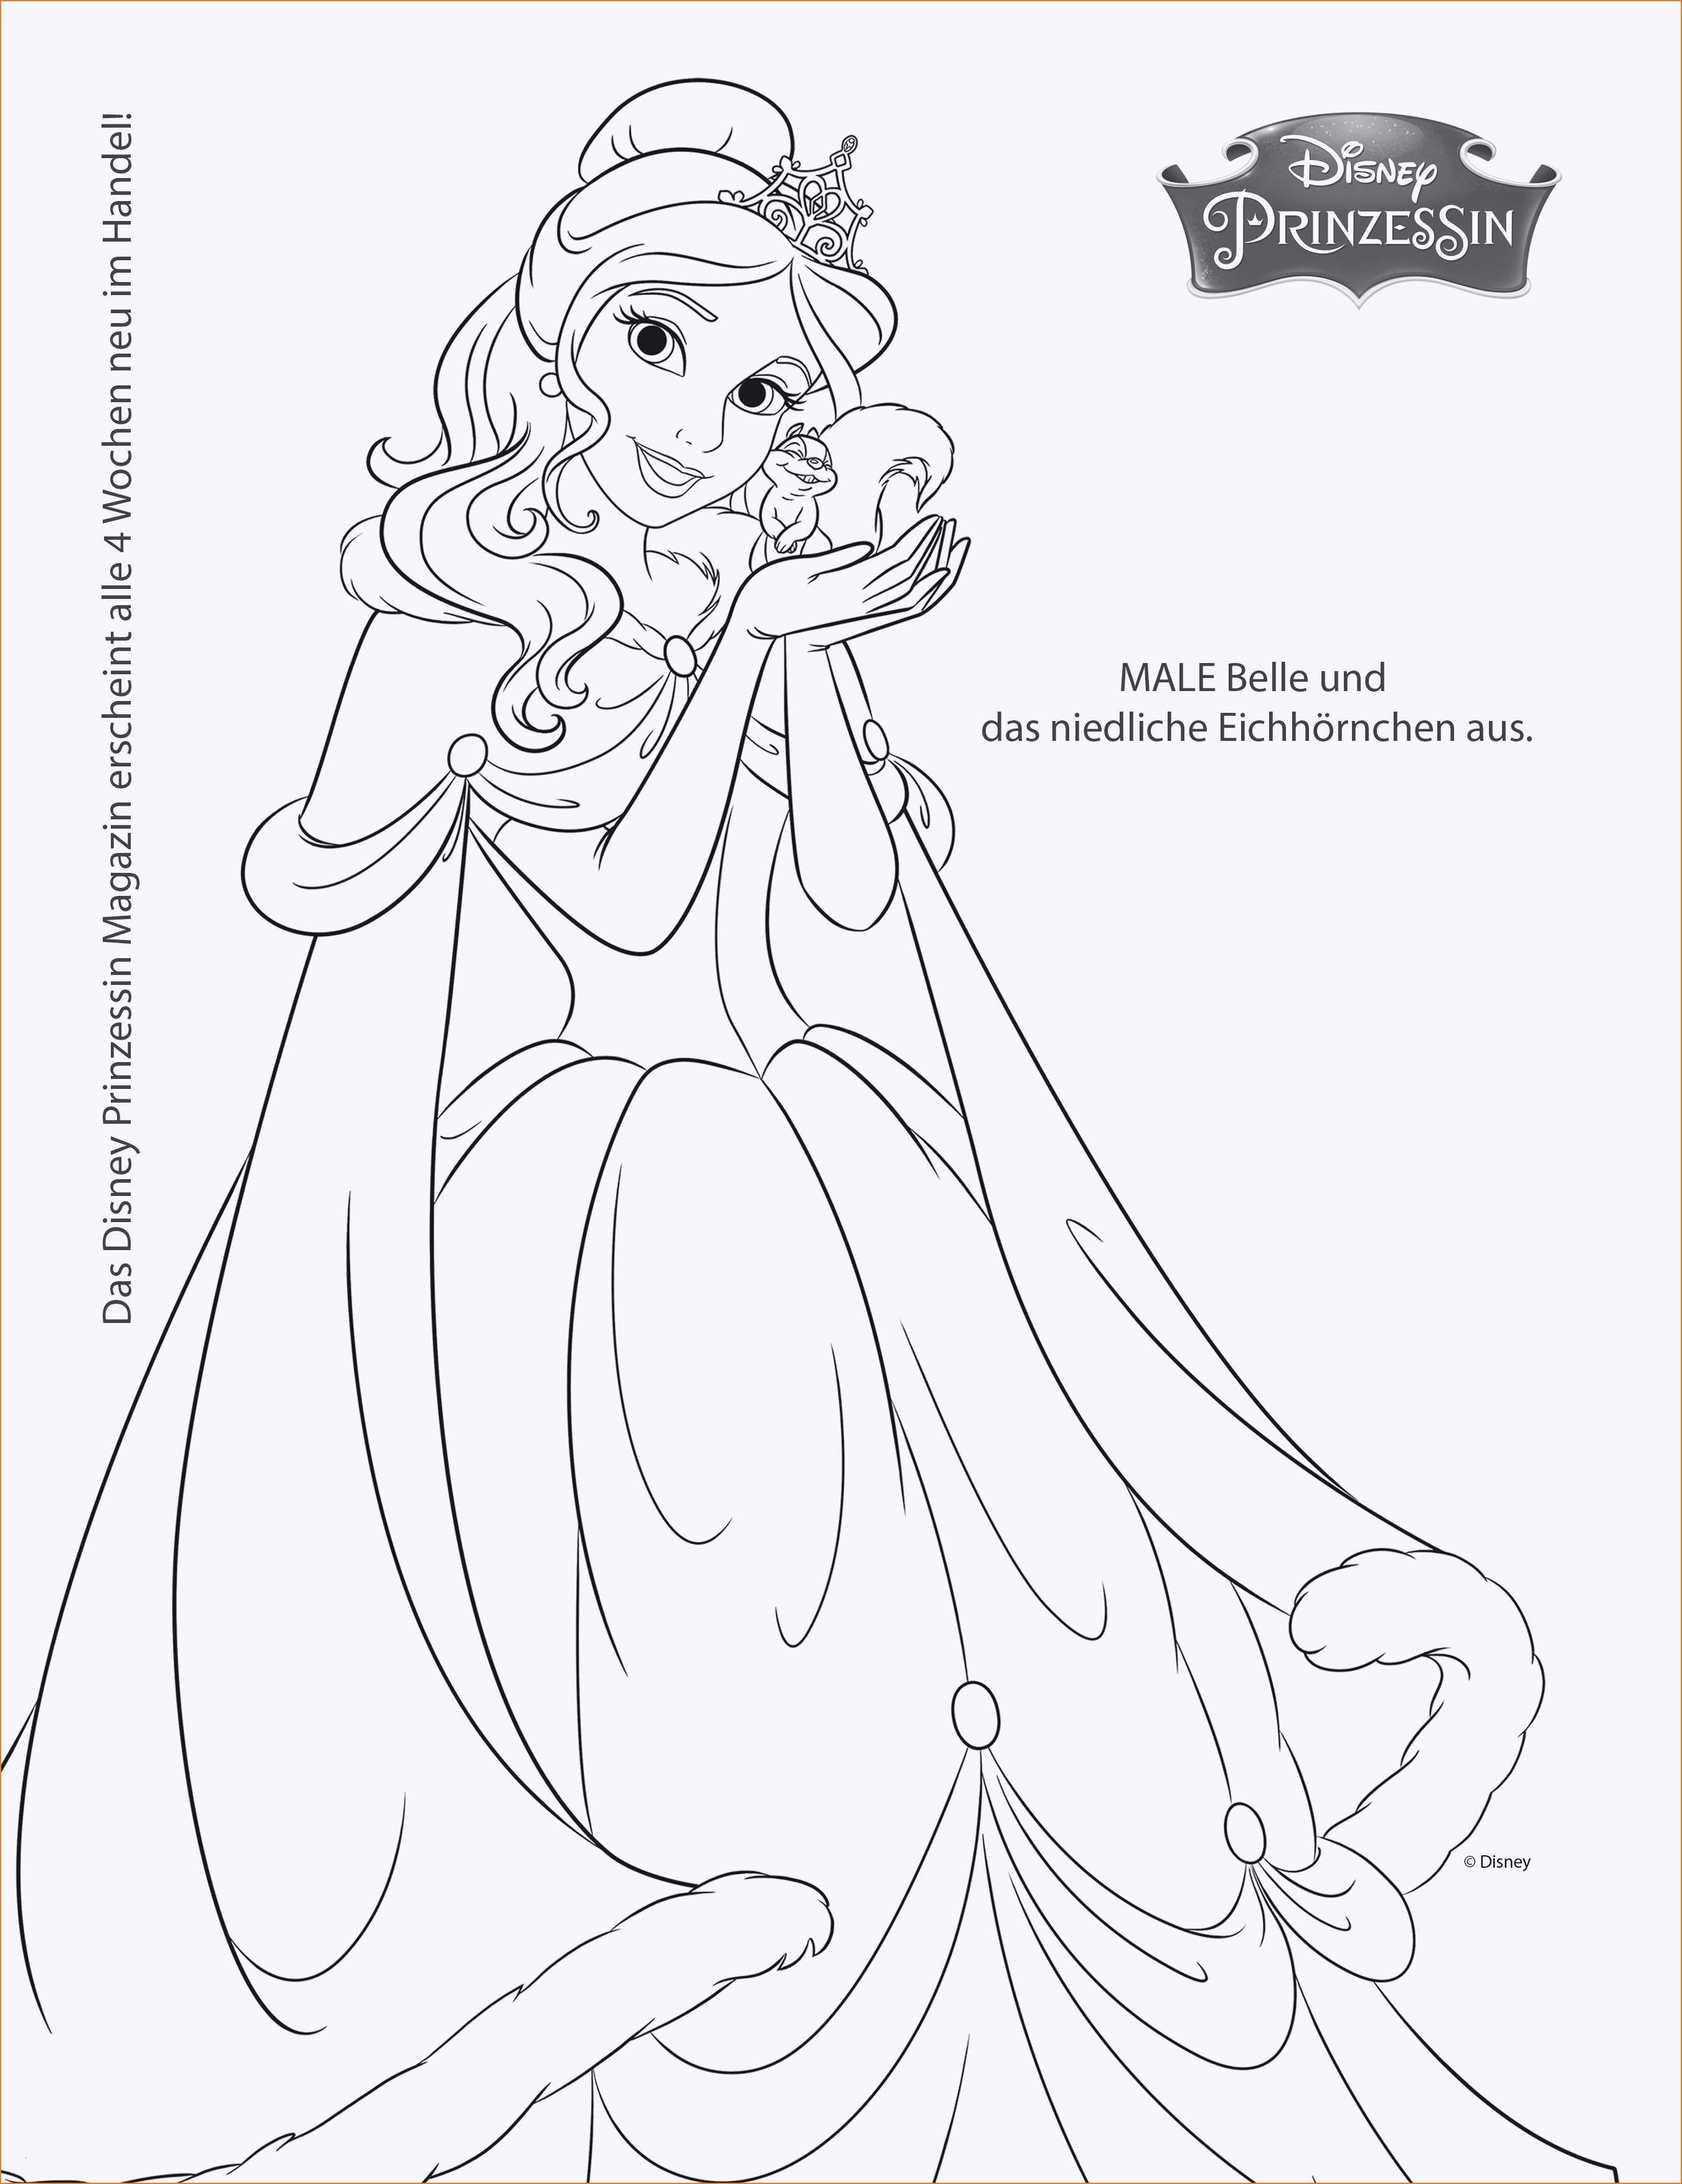 Ausmalbilder Marvel Helden Frisch Ausmalbilder Muschel Lovely Foto Van Patty Bartlett Kleurplaat Luxus Fotografieren